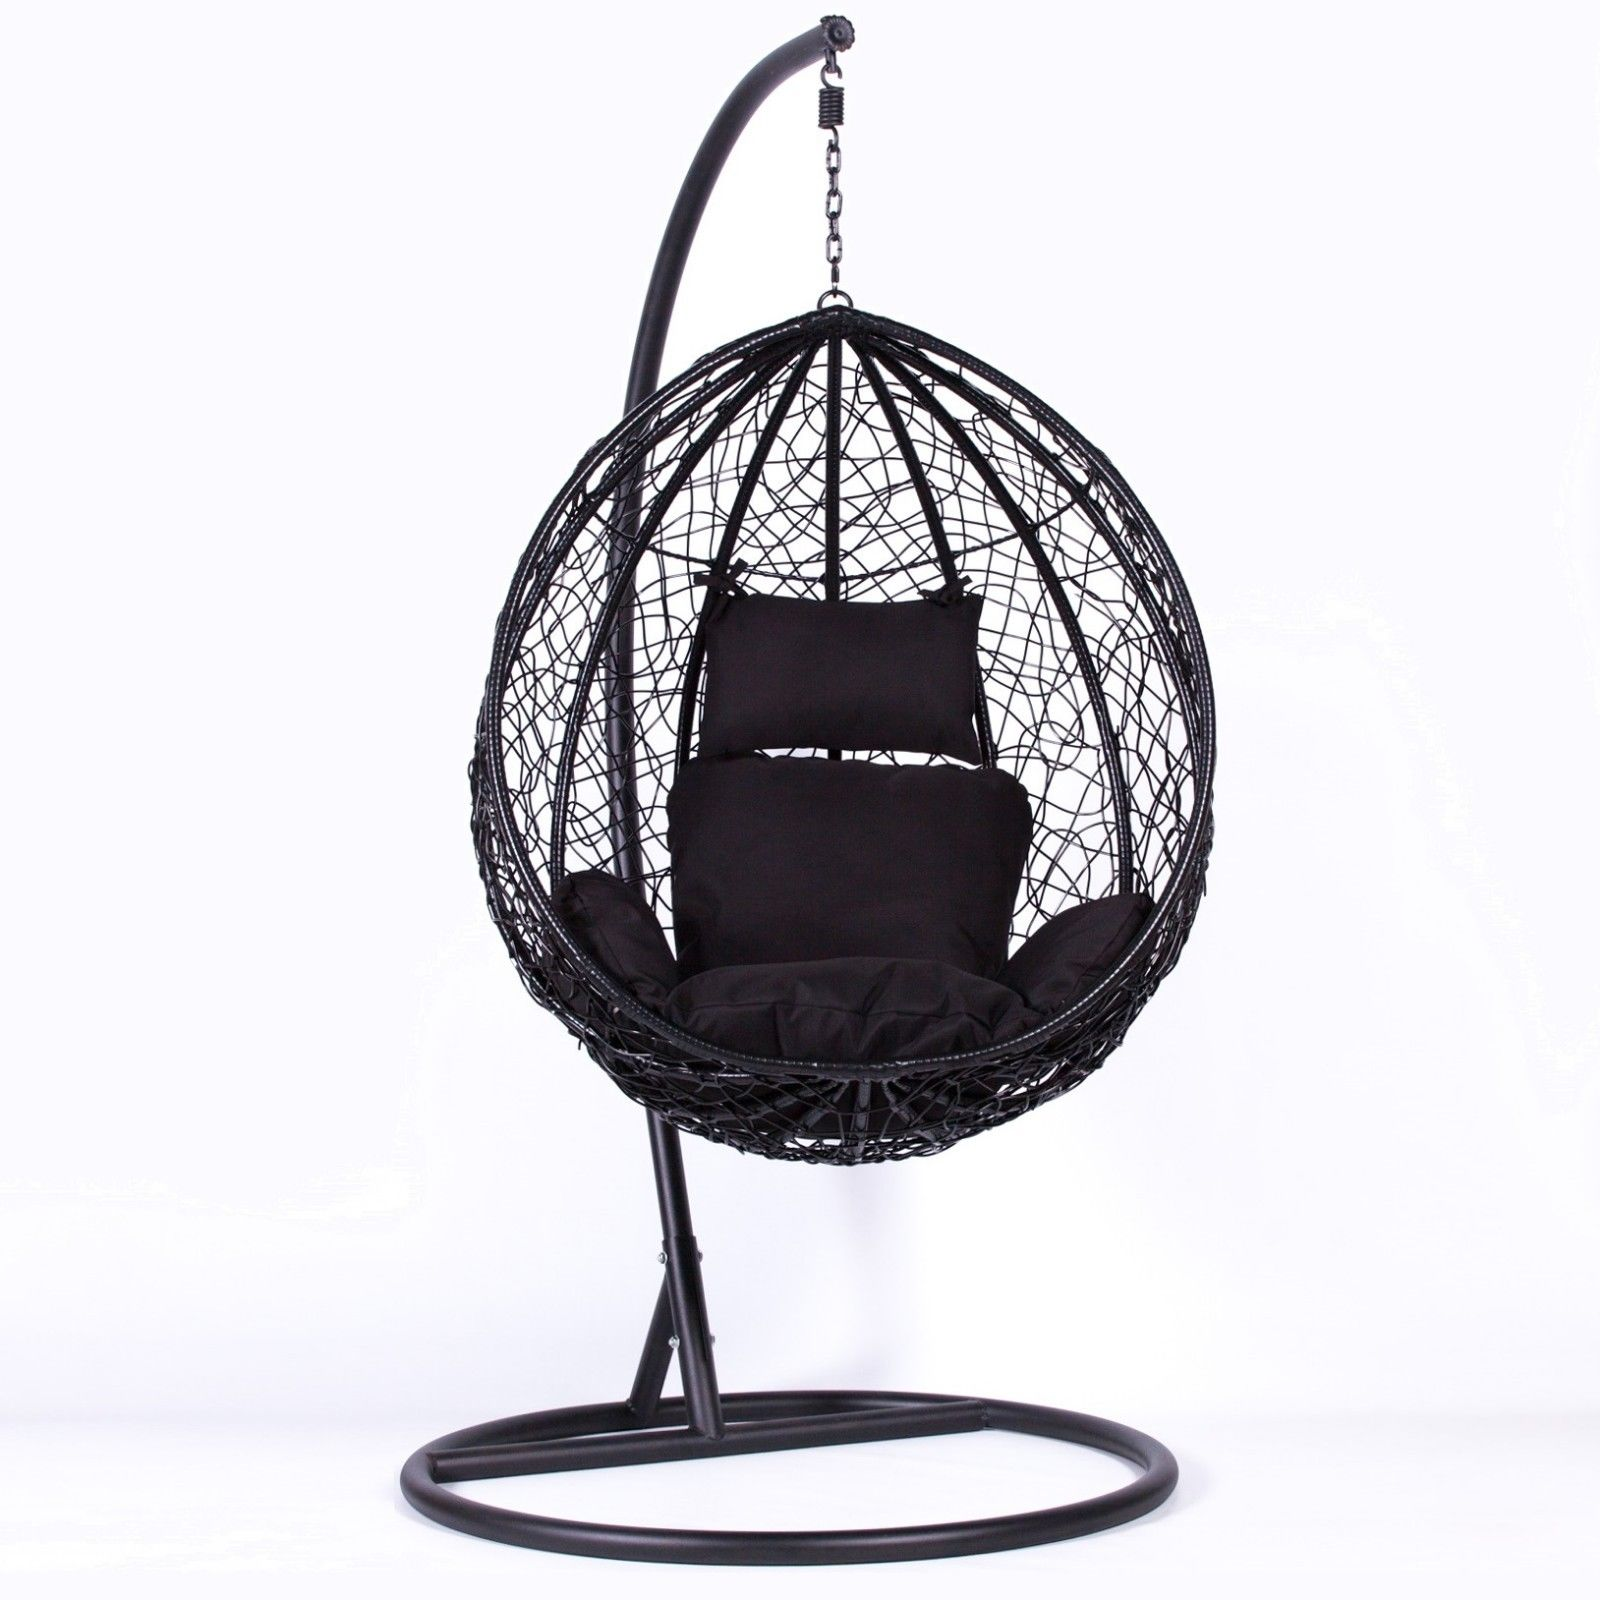 Rattan Black Swing Weave Patio Garden Hanging Egg Chair